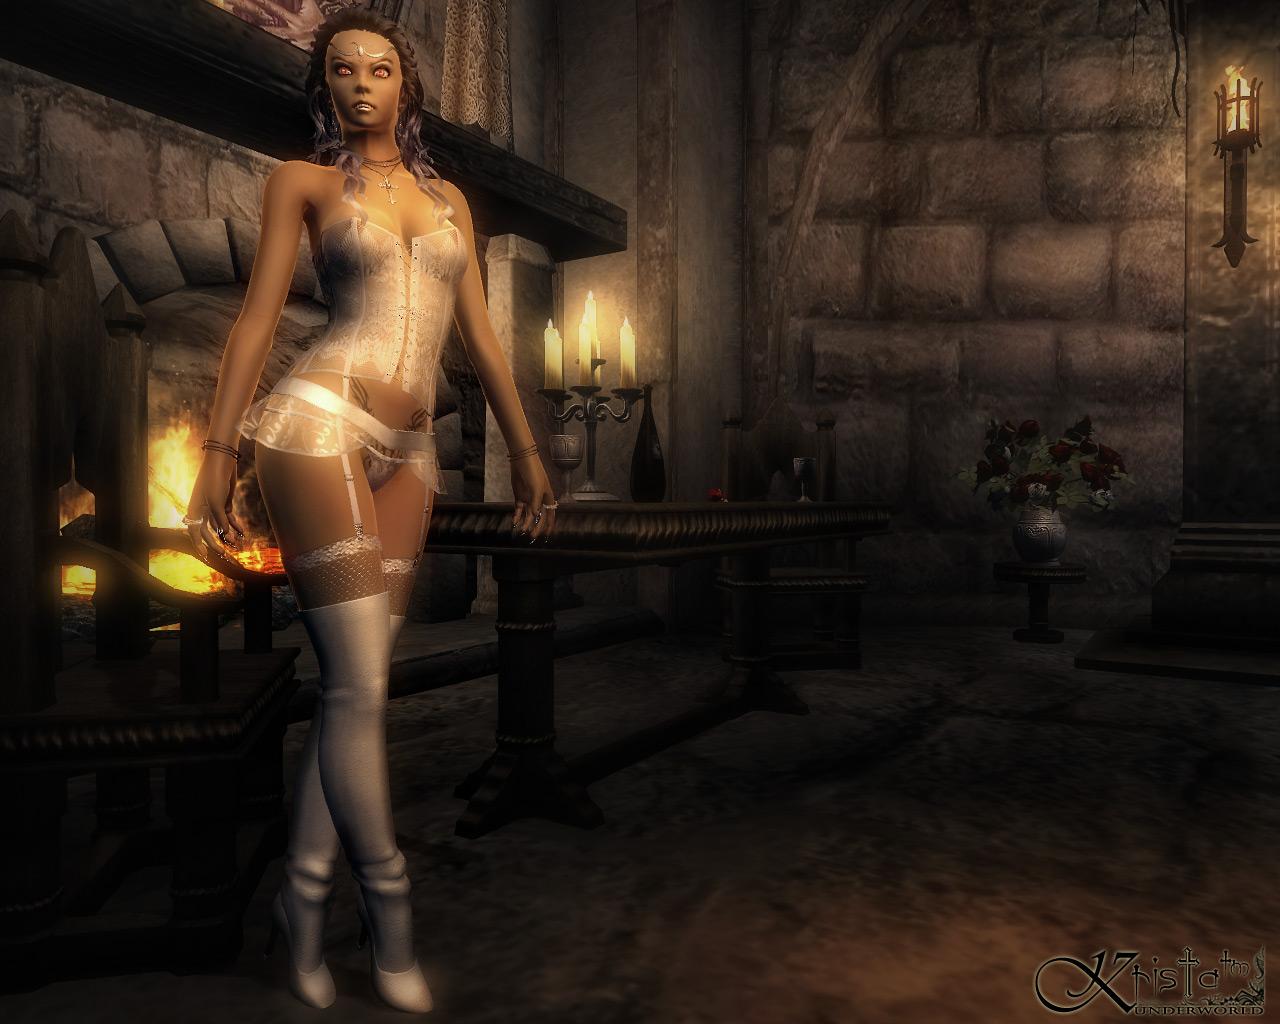 Oblivion erect erotic scene